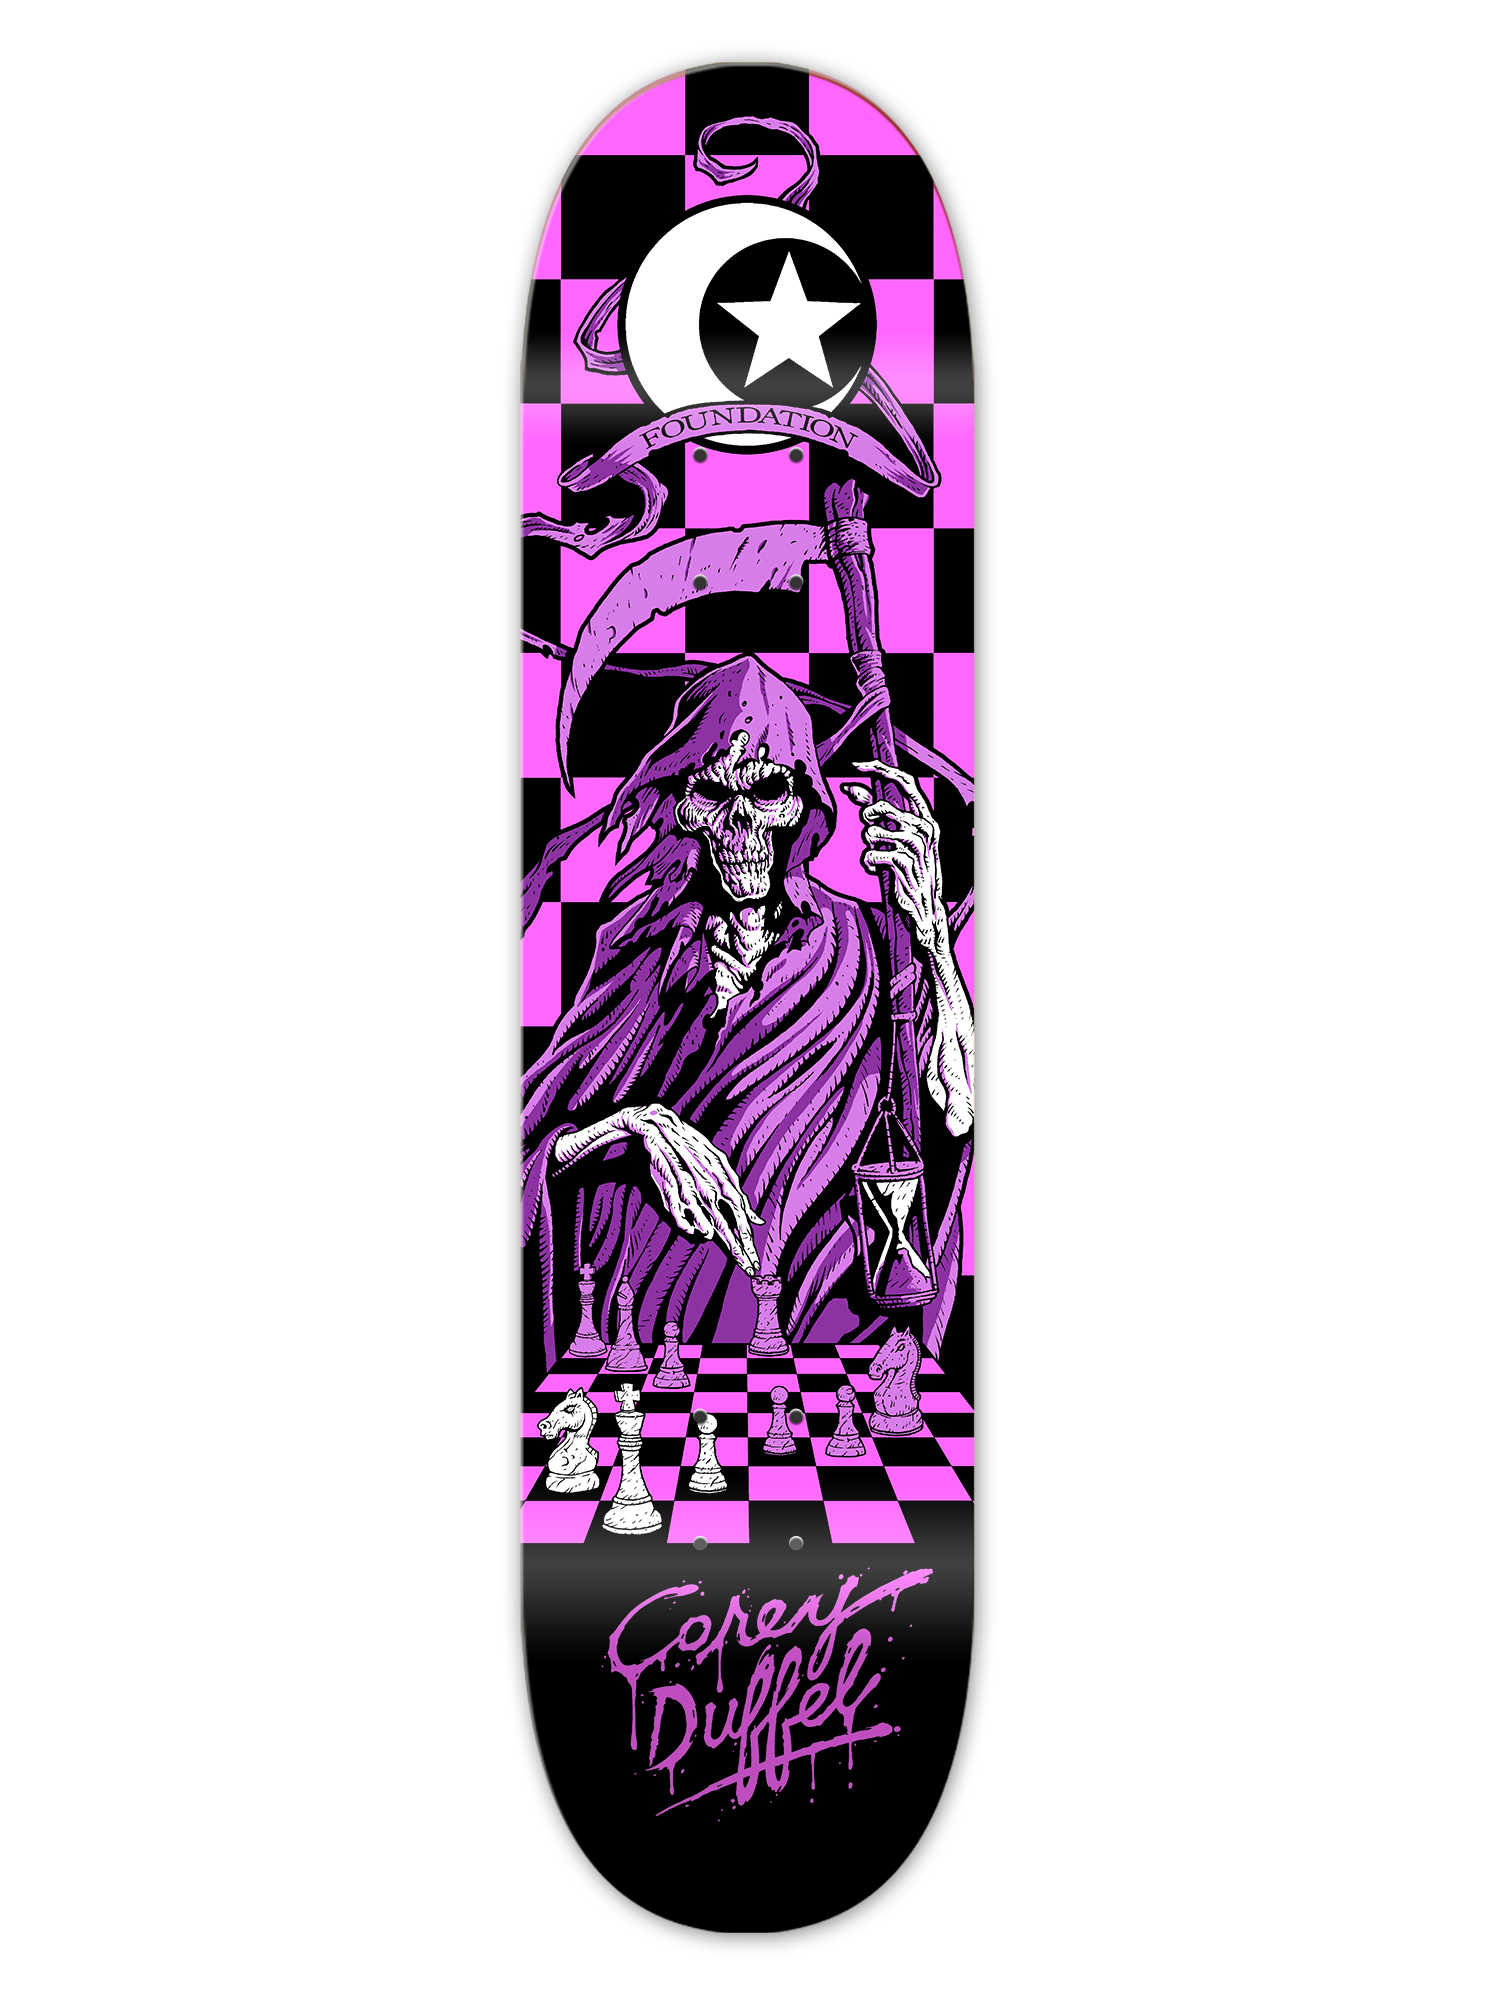 Duffel_Checkmate_Deck_skinny.jpg